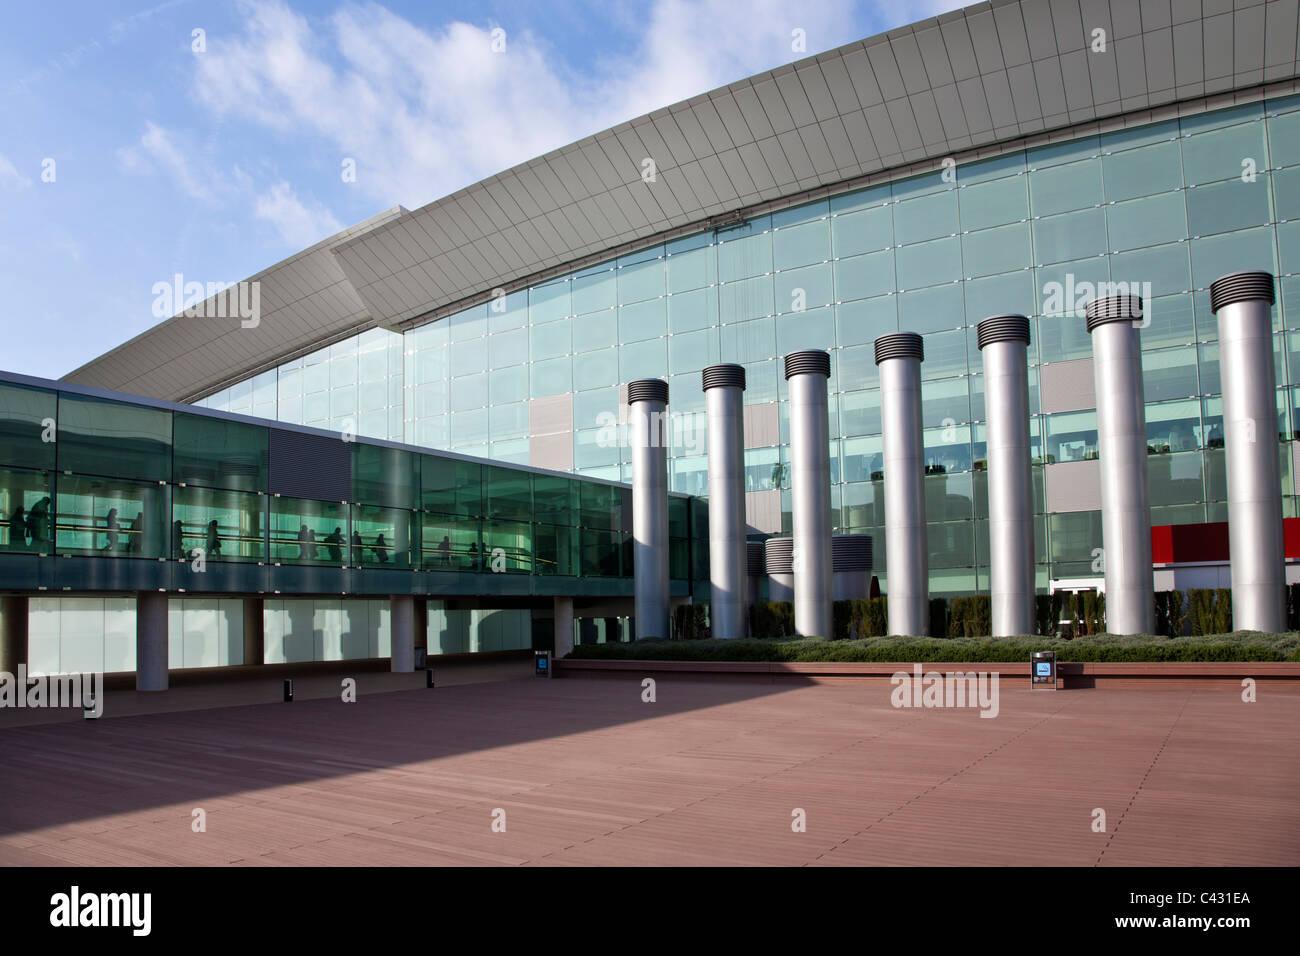 El Prat airport. Barcelona. Spain - Stock Image